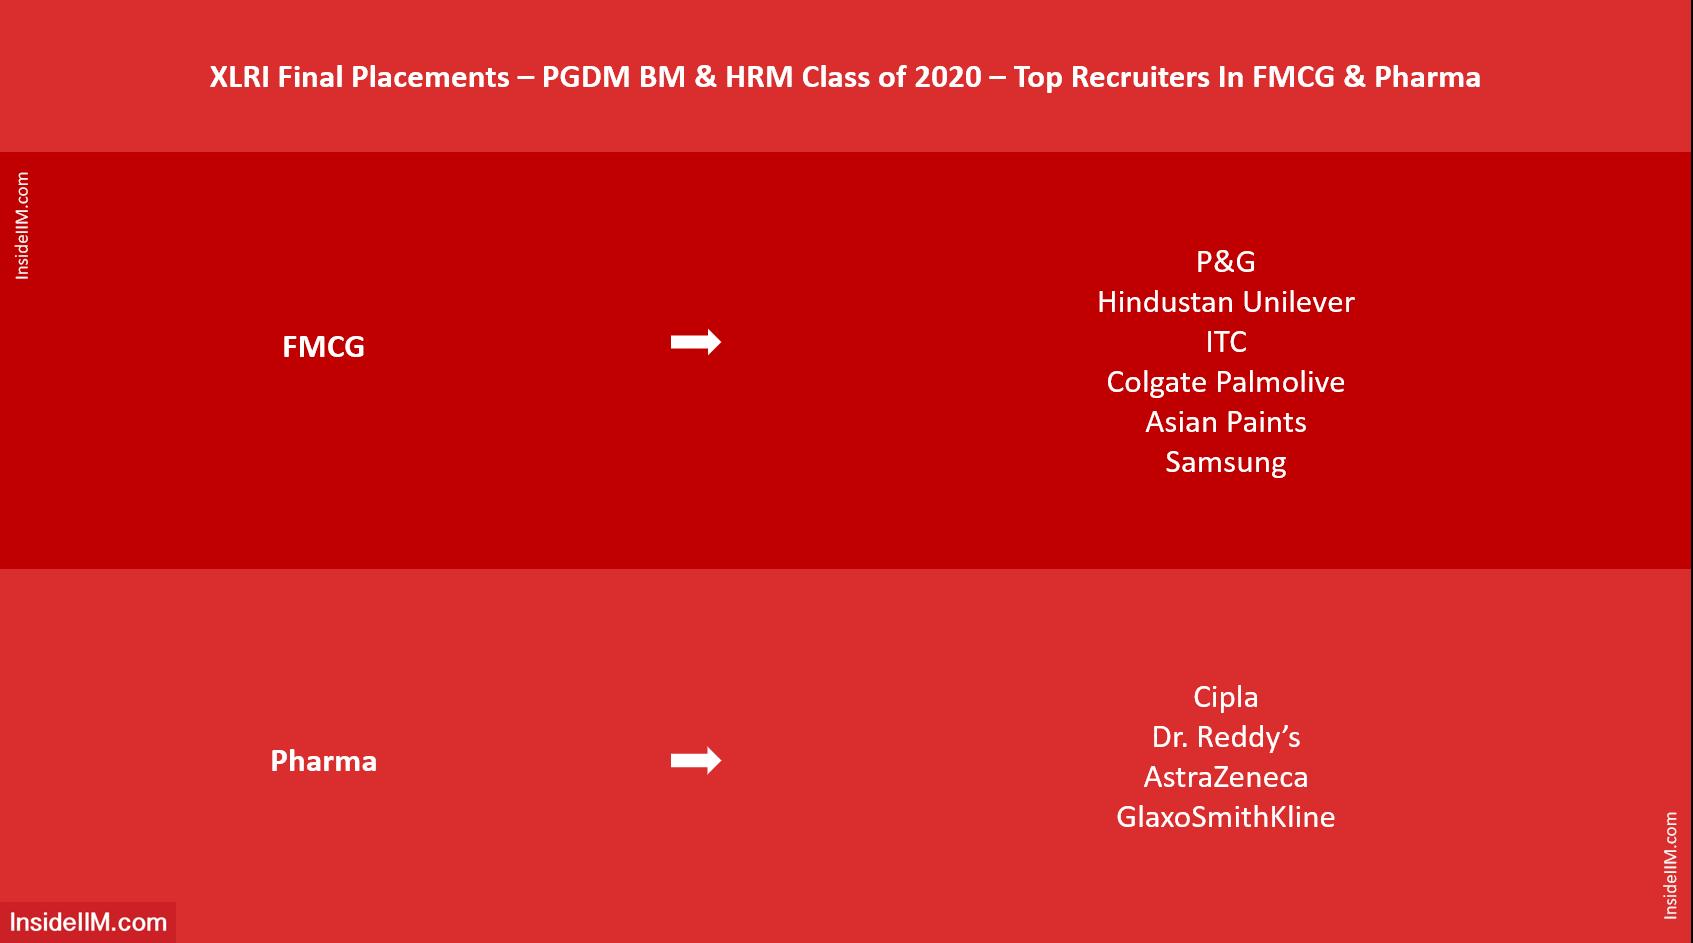 XLRI Final Placements 2020 - Top FMCG, Pharma Recruiters